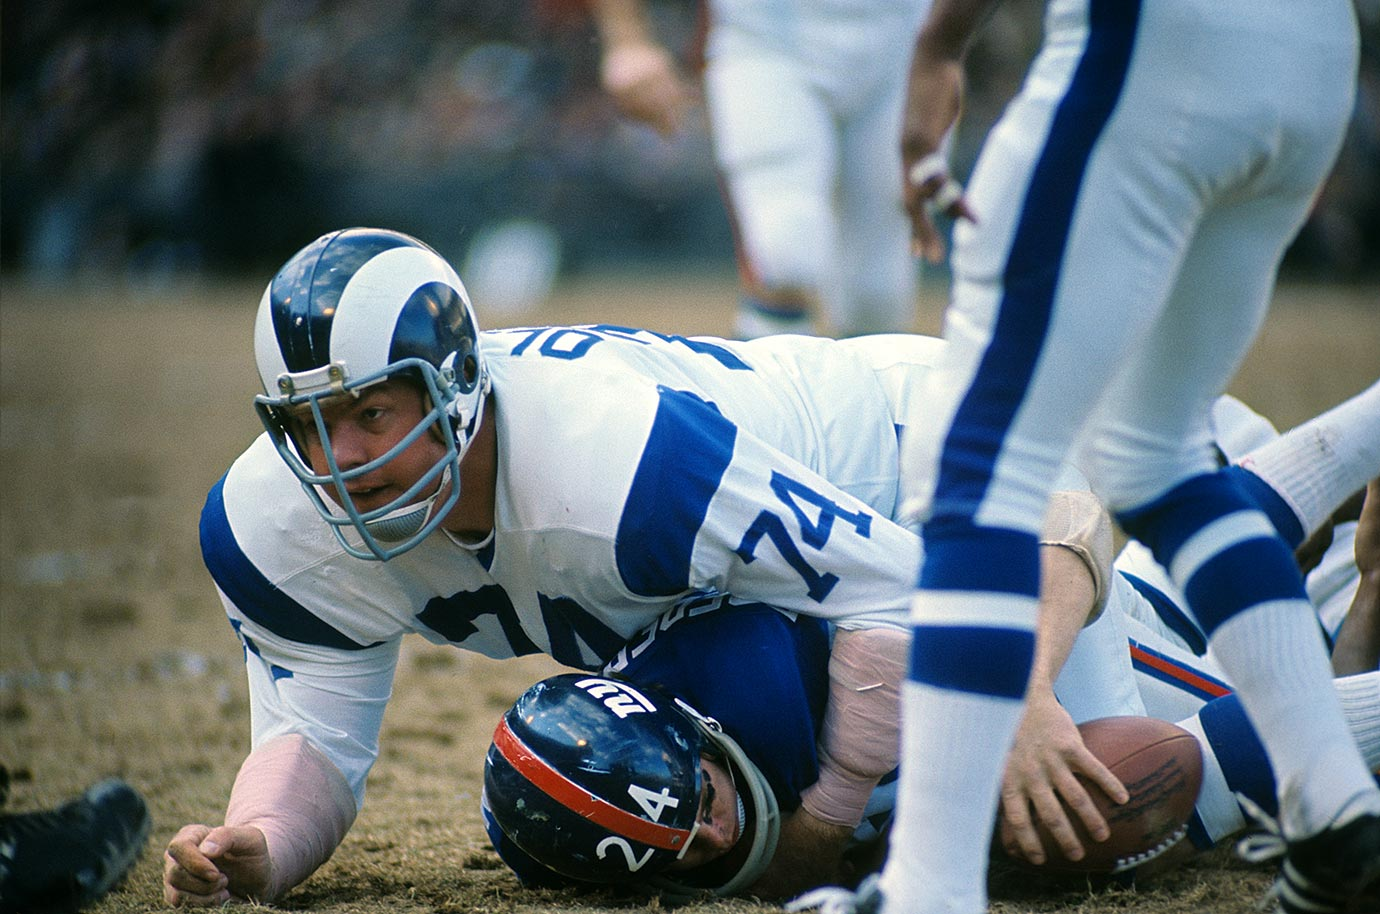 Dec. 20, 1970 — Los Angeles Rams vs. New York Giants